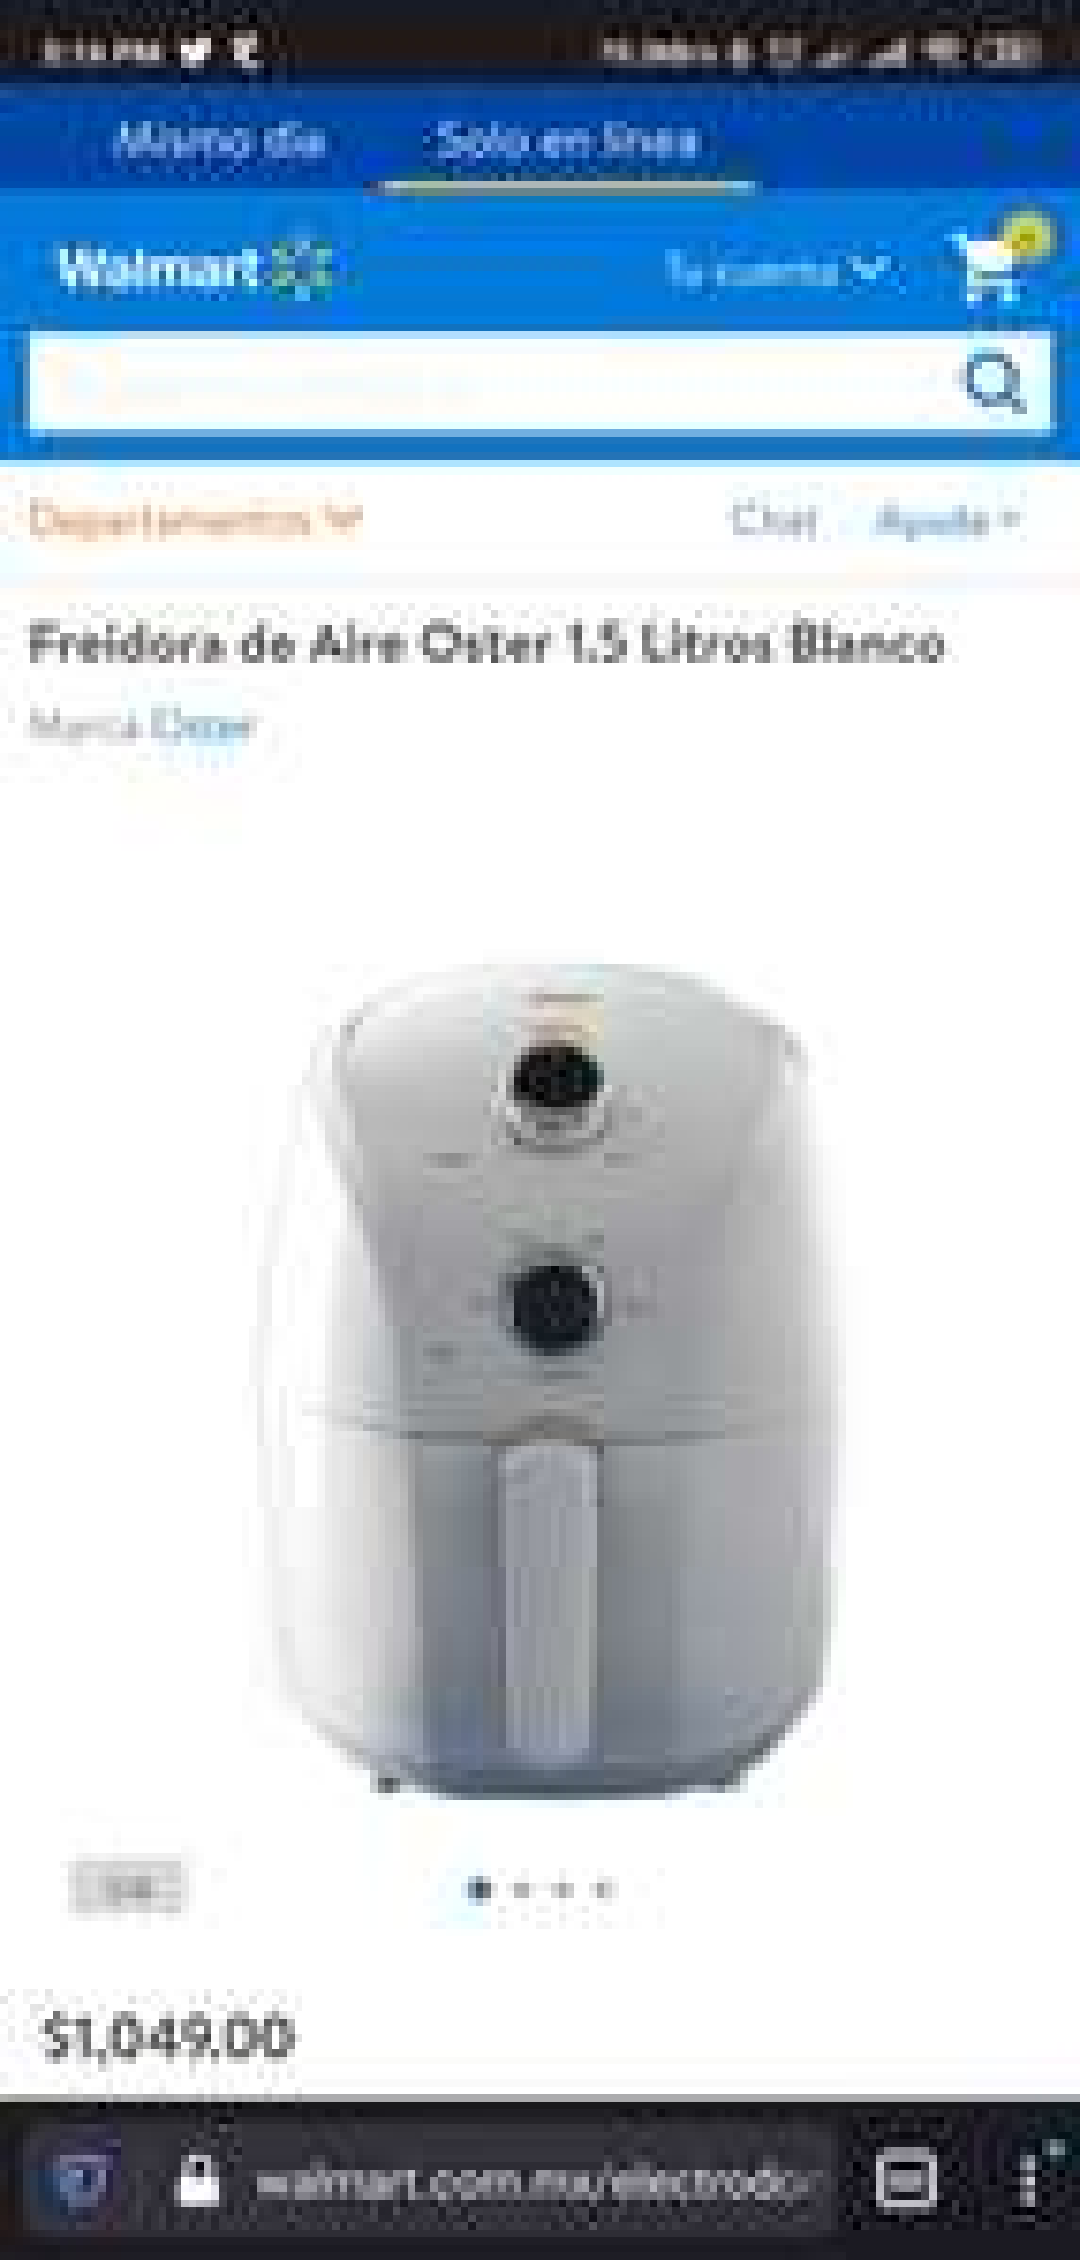 Walmart: Freidora de Aire Oster 1.5 Litros Blanco